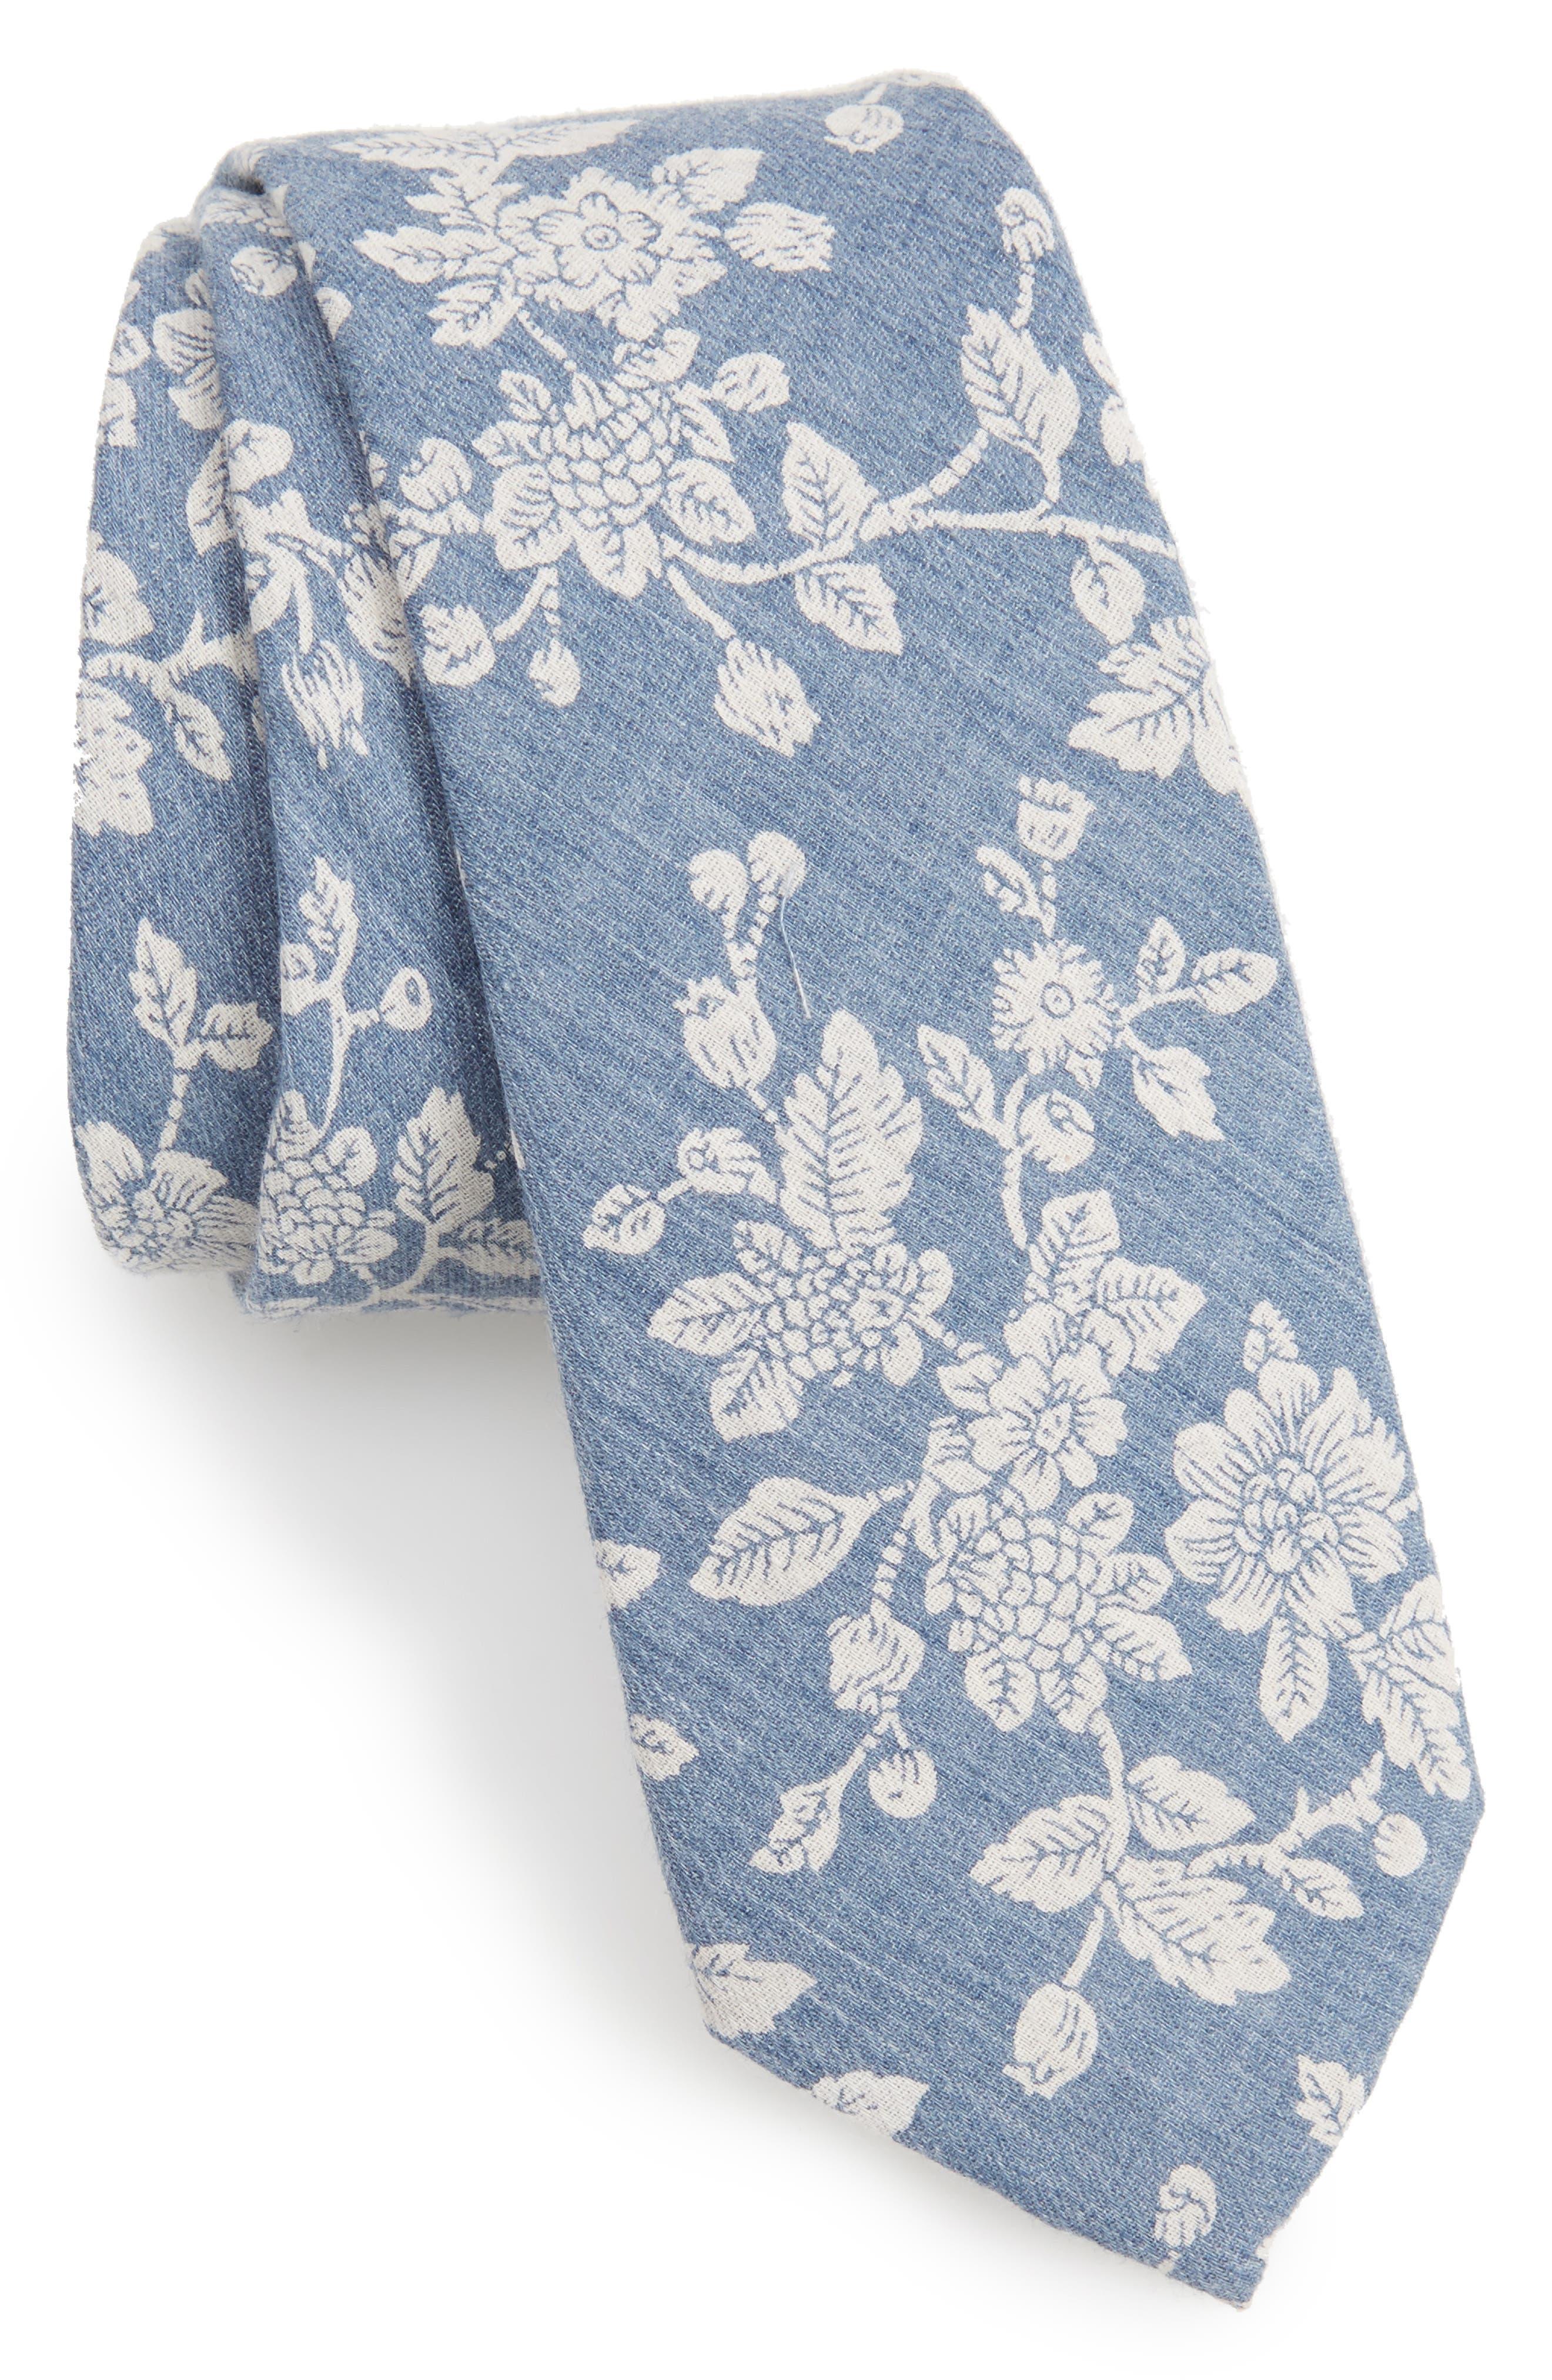 Floral Cotton Skinny Tie,                             Main thumbnail 1, color,                             401